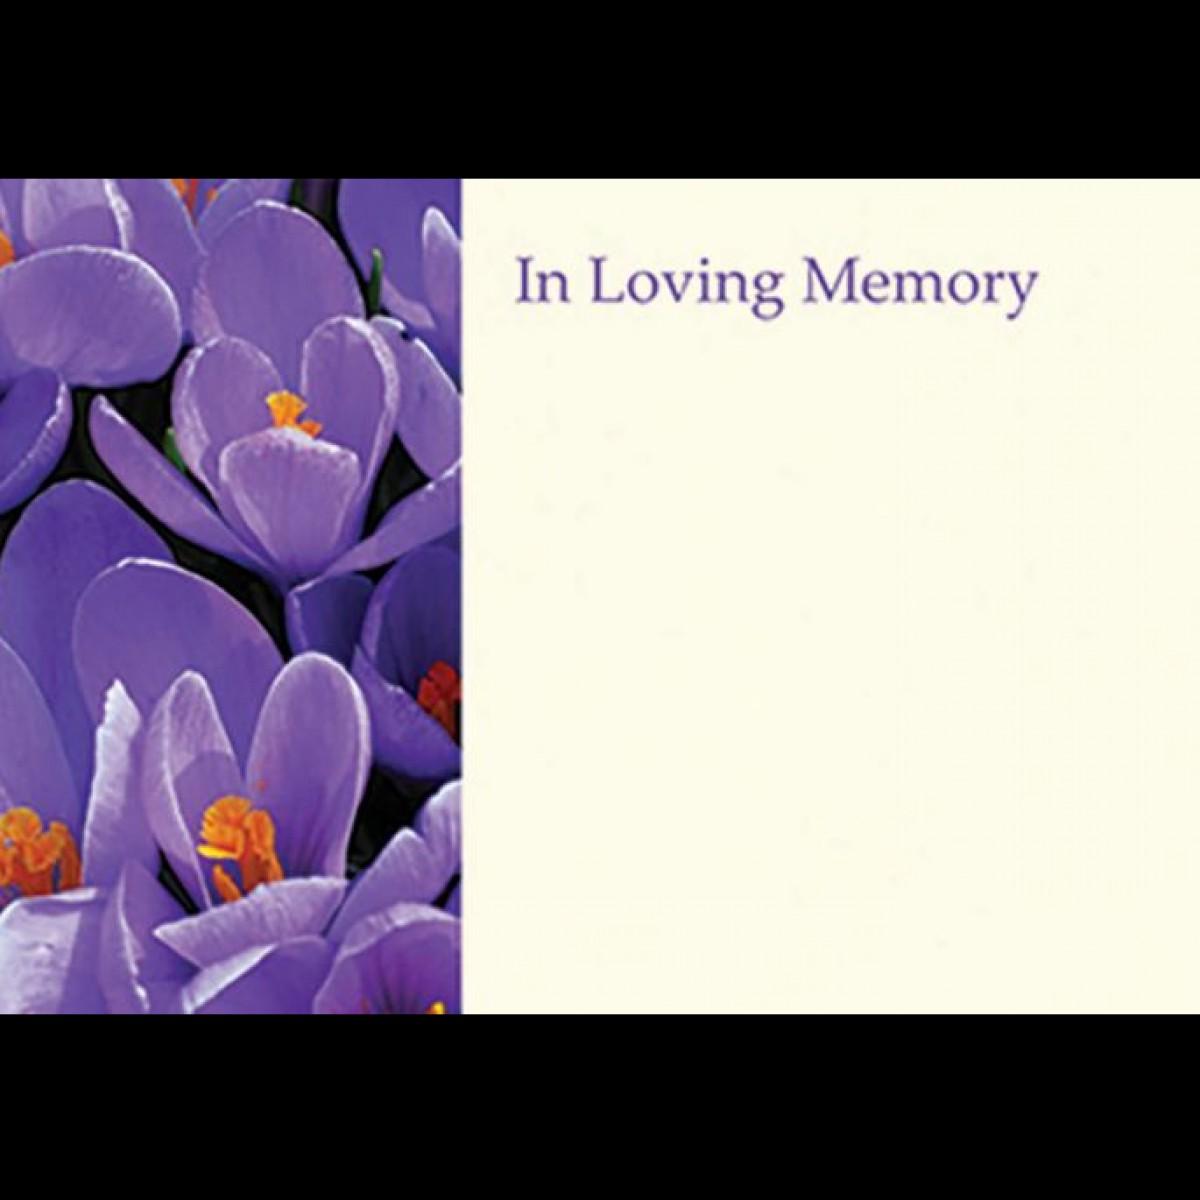 4504 I/L/MEM Crocus Purple 9x6cm 50x1 Cards